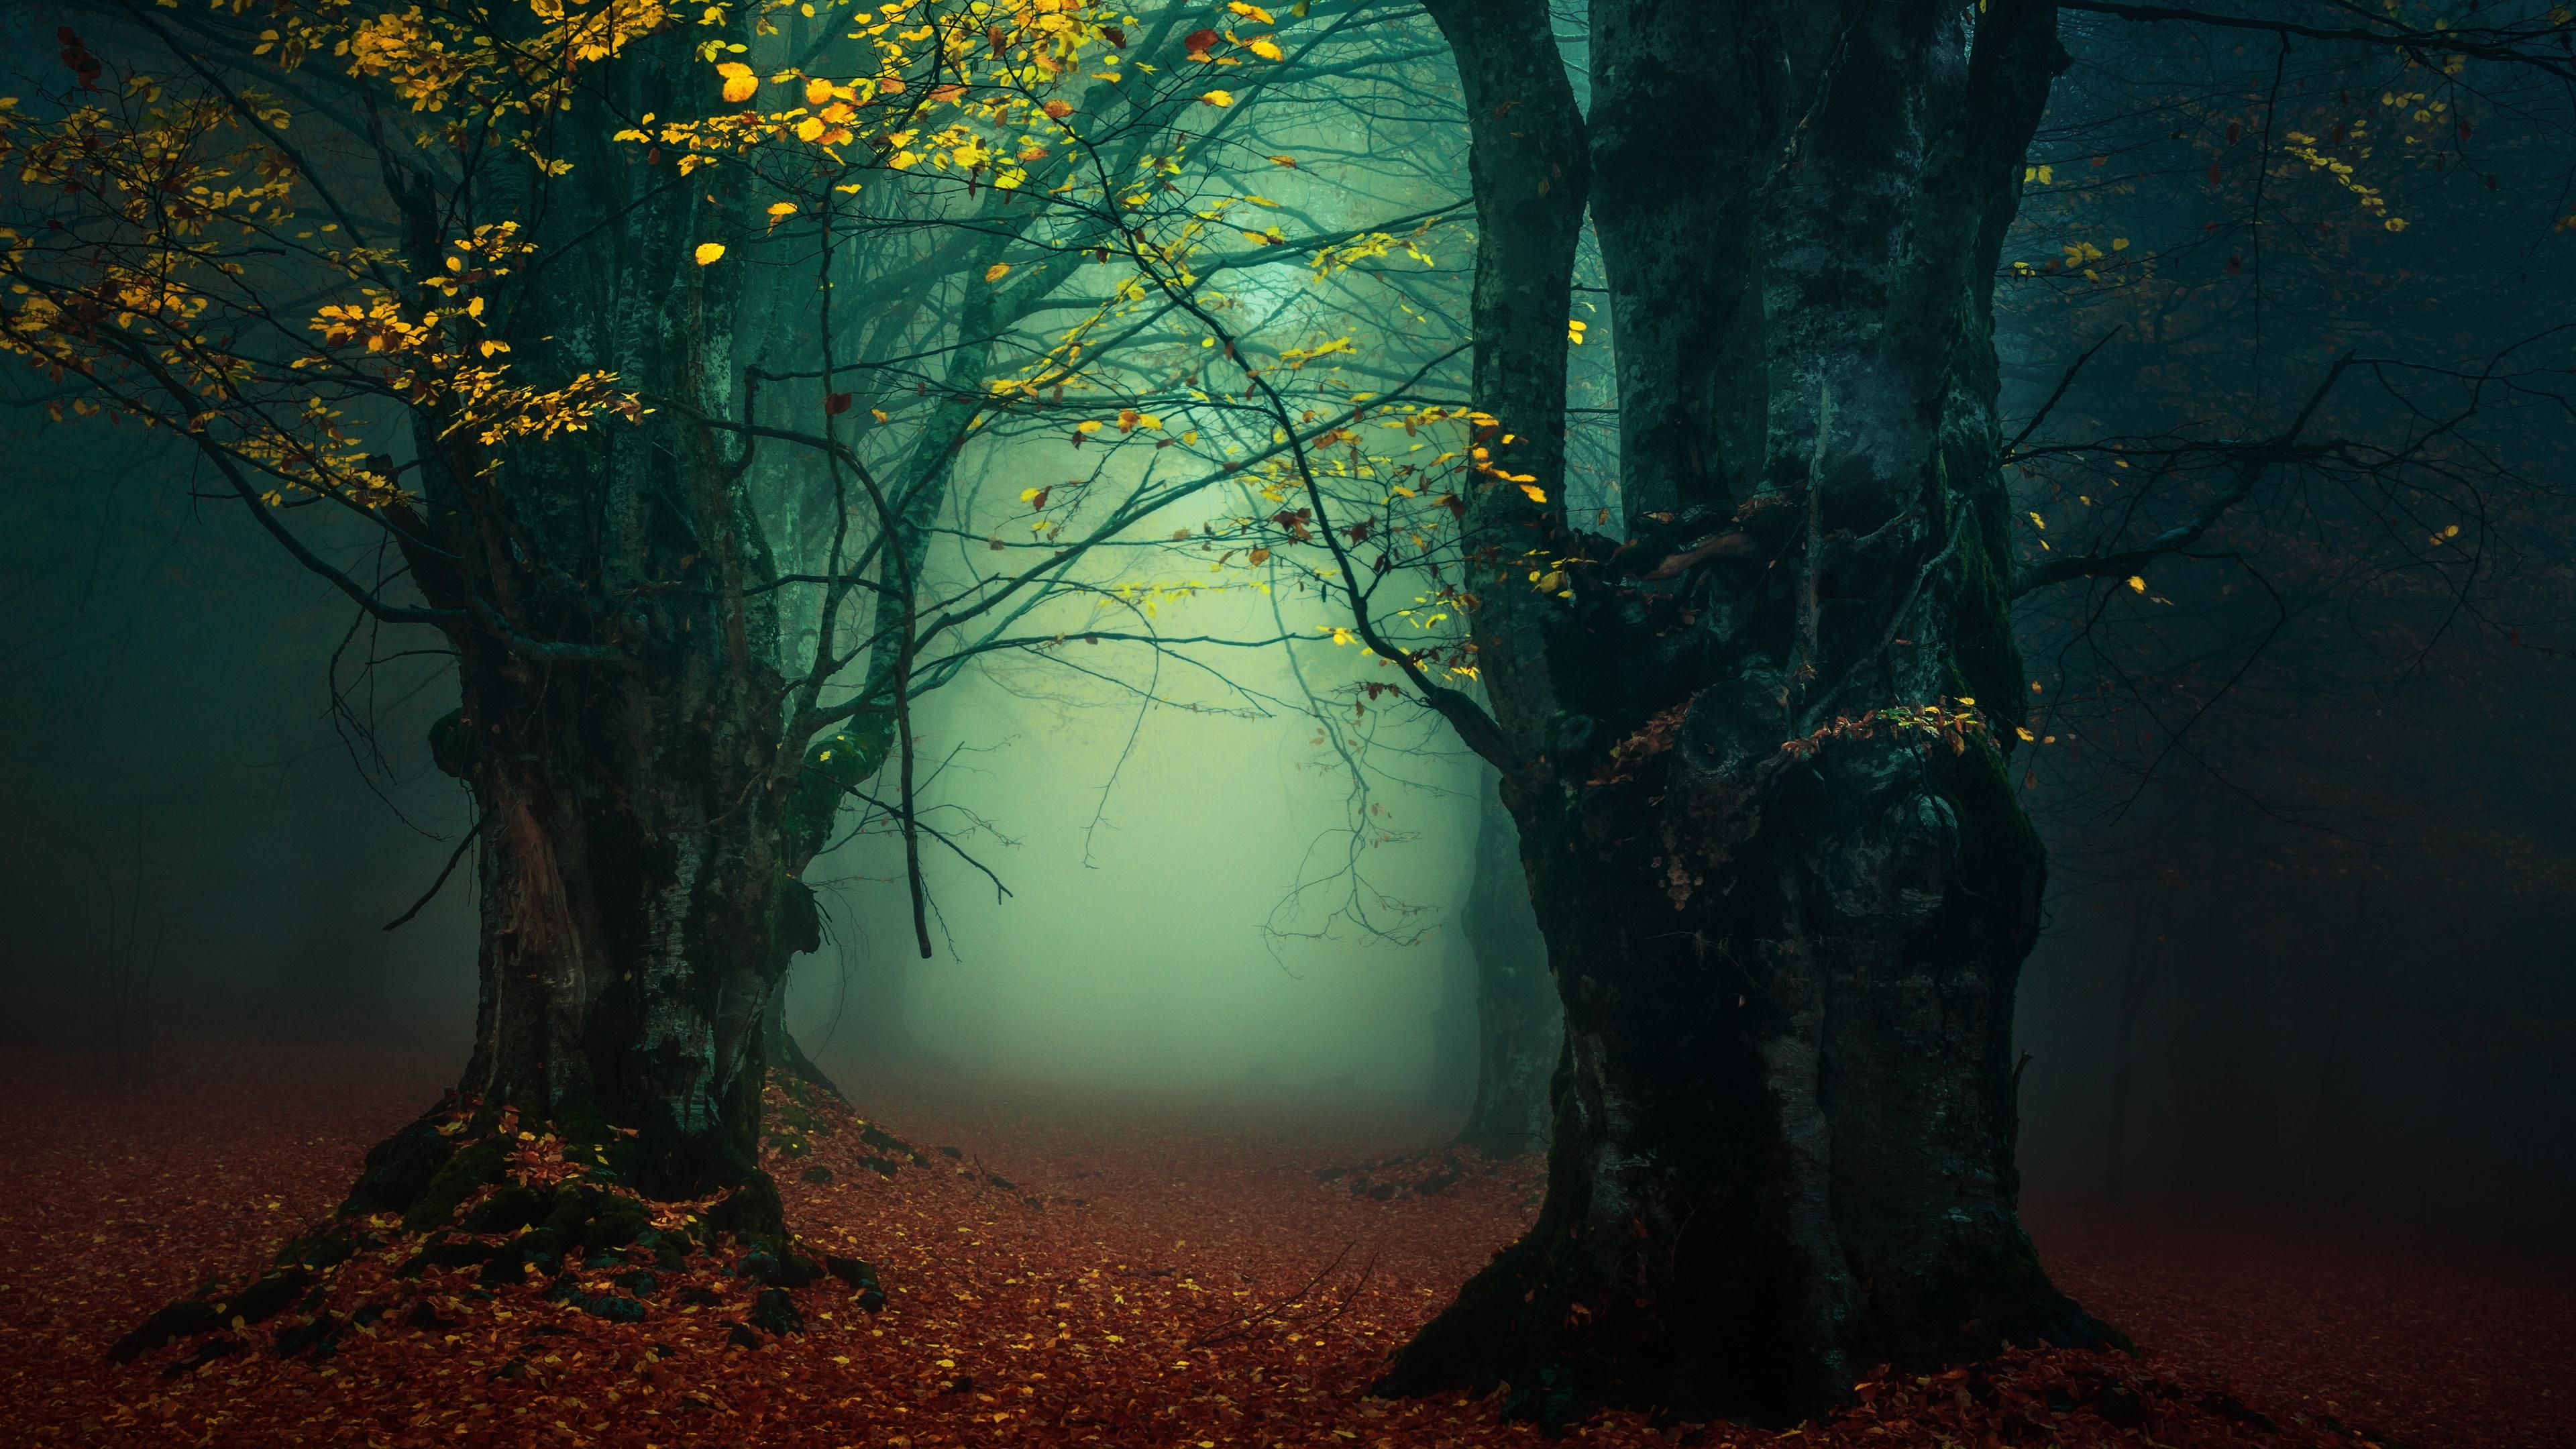 Misty forest lane wallpaper